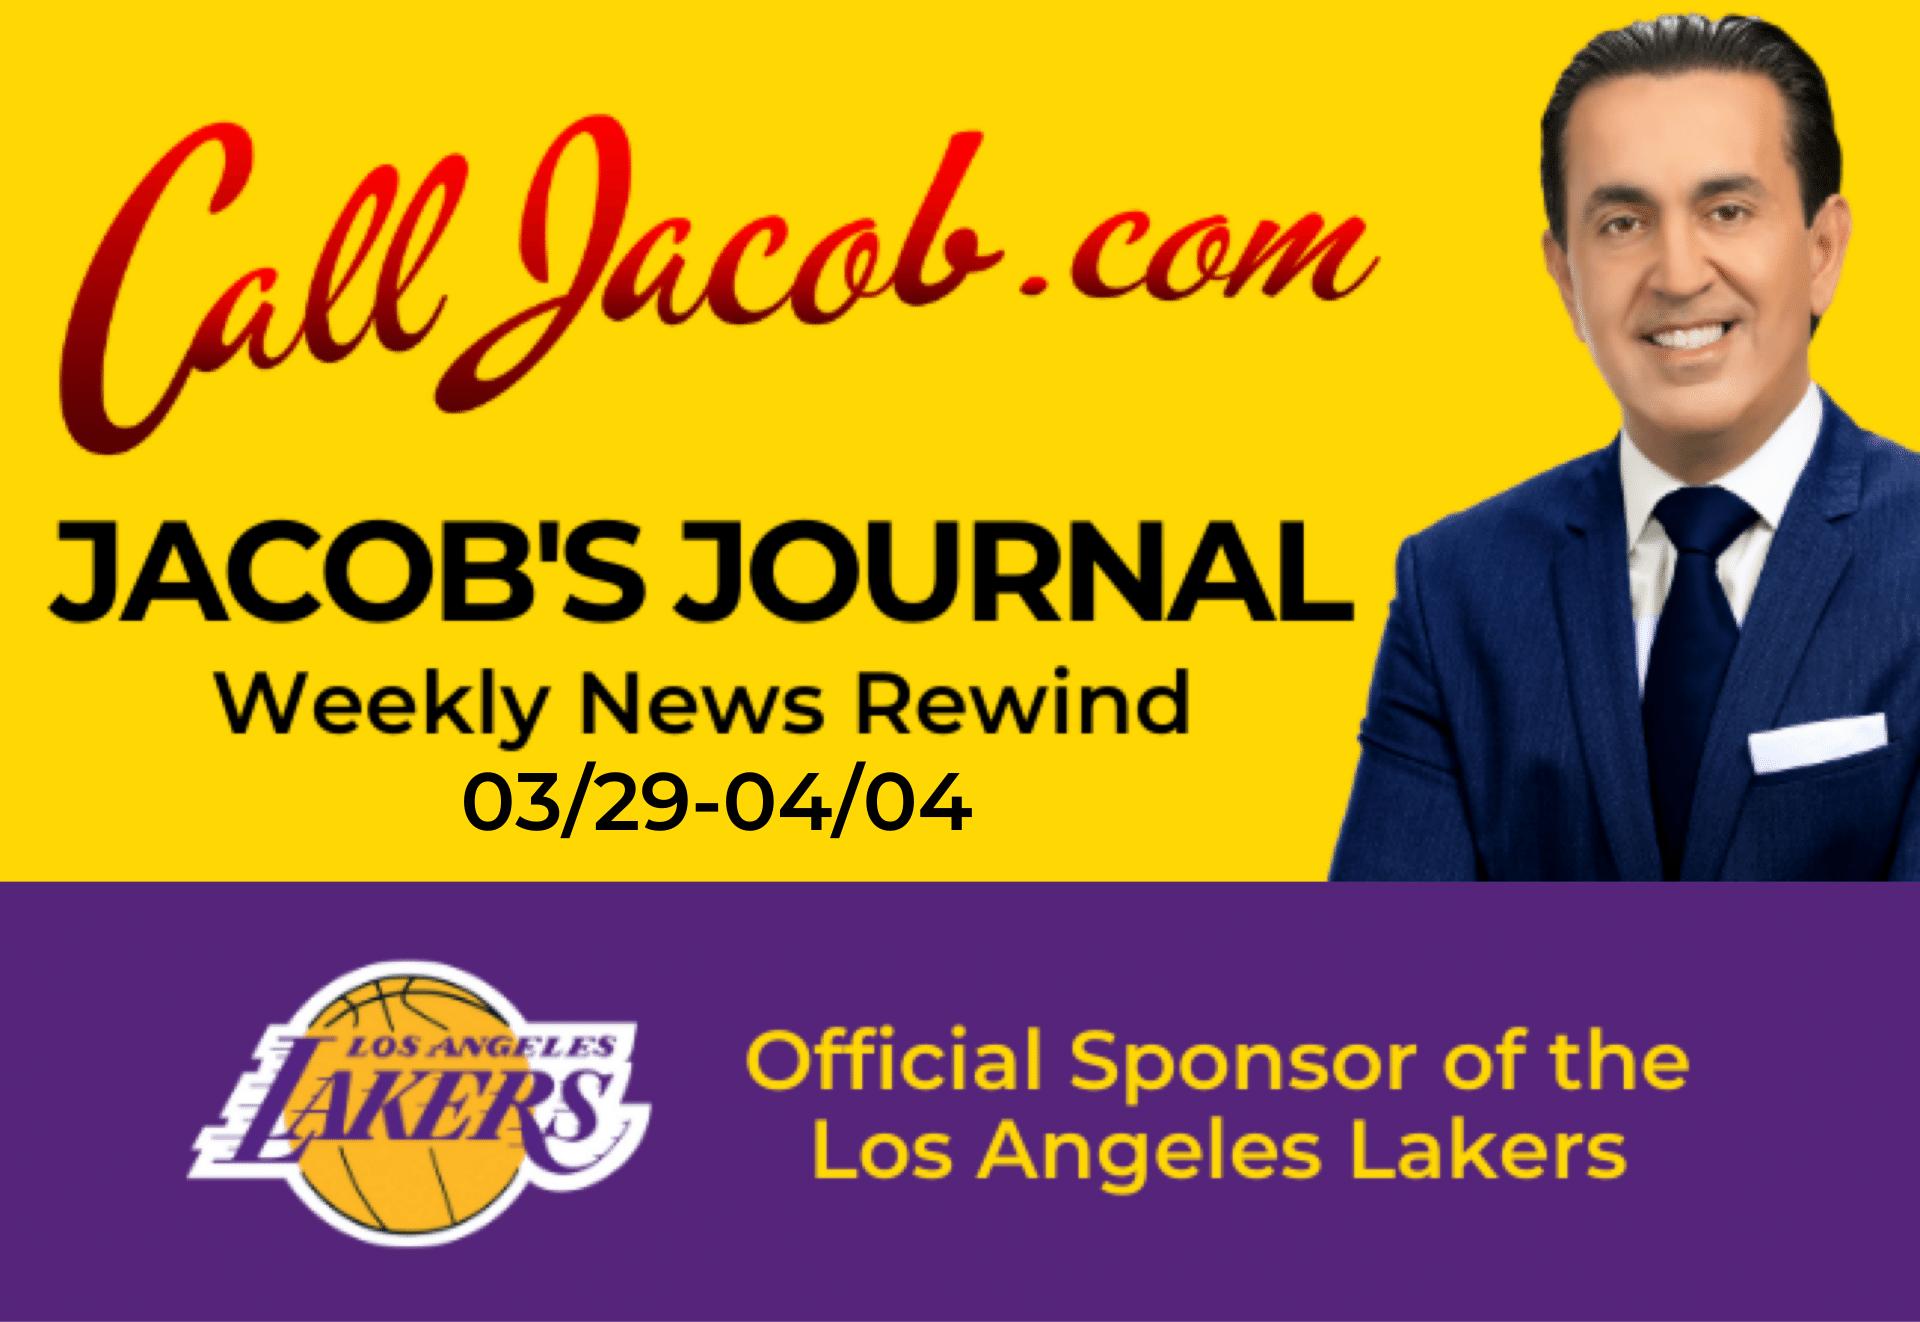 JacobsJournalWeeklyNewsRewind March 29th to April 4th 2021